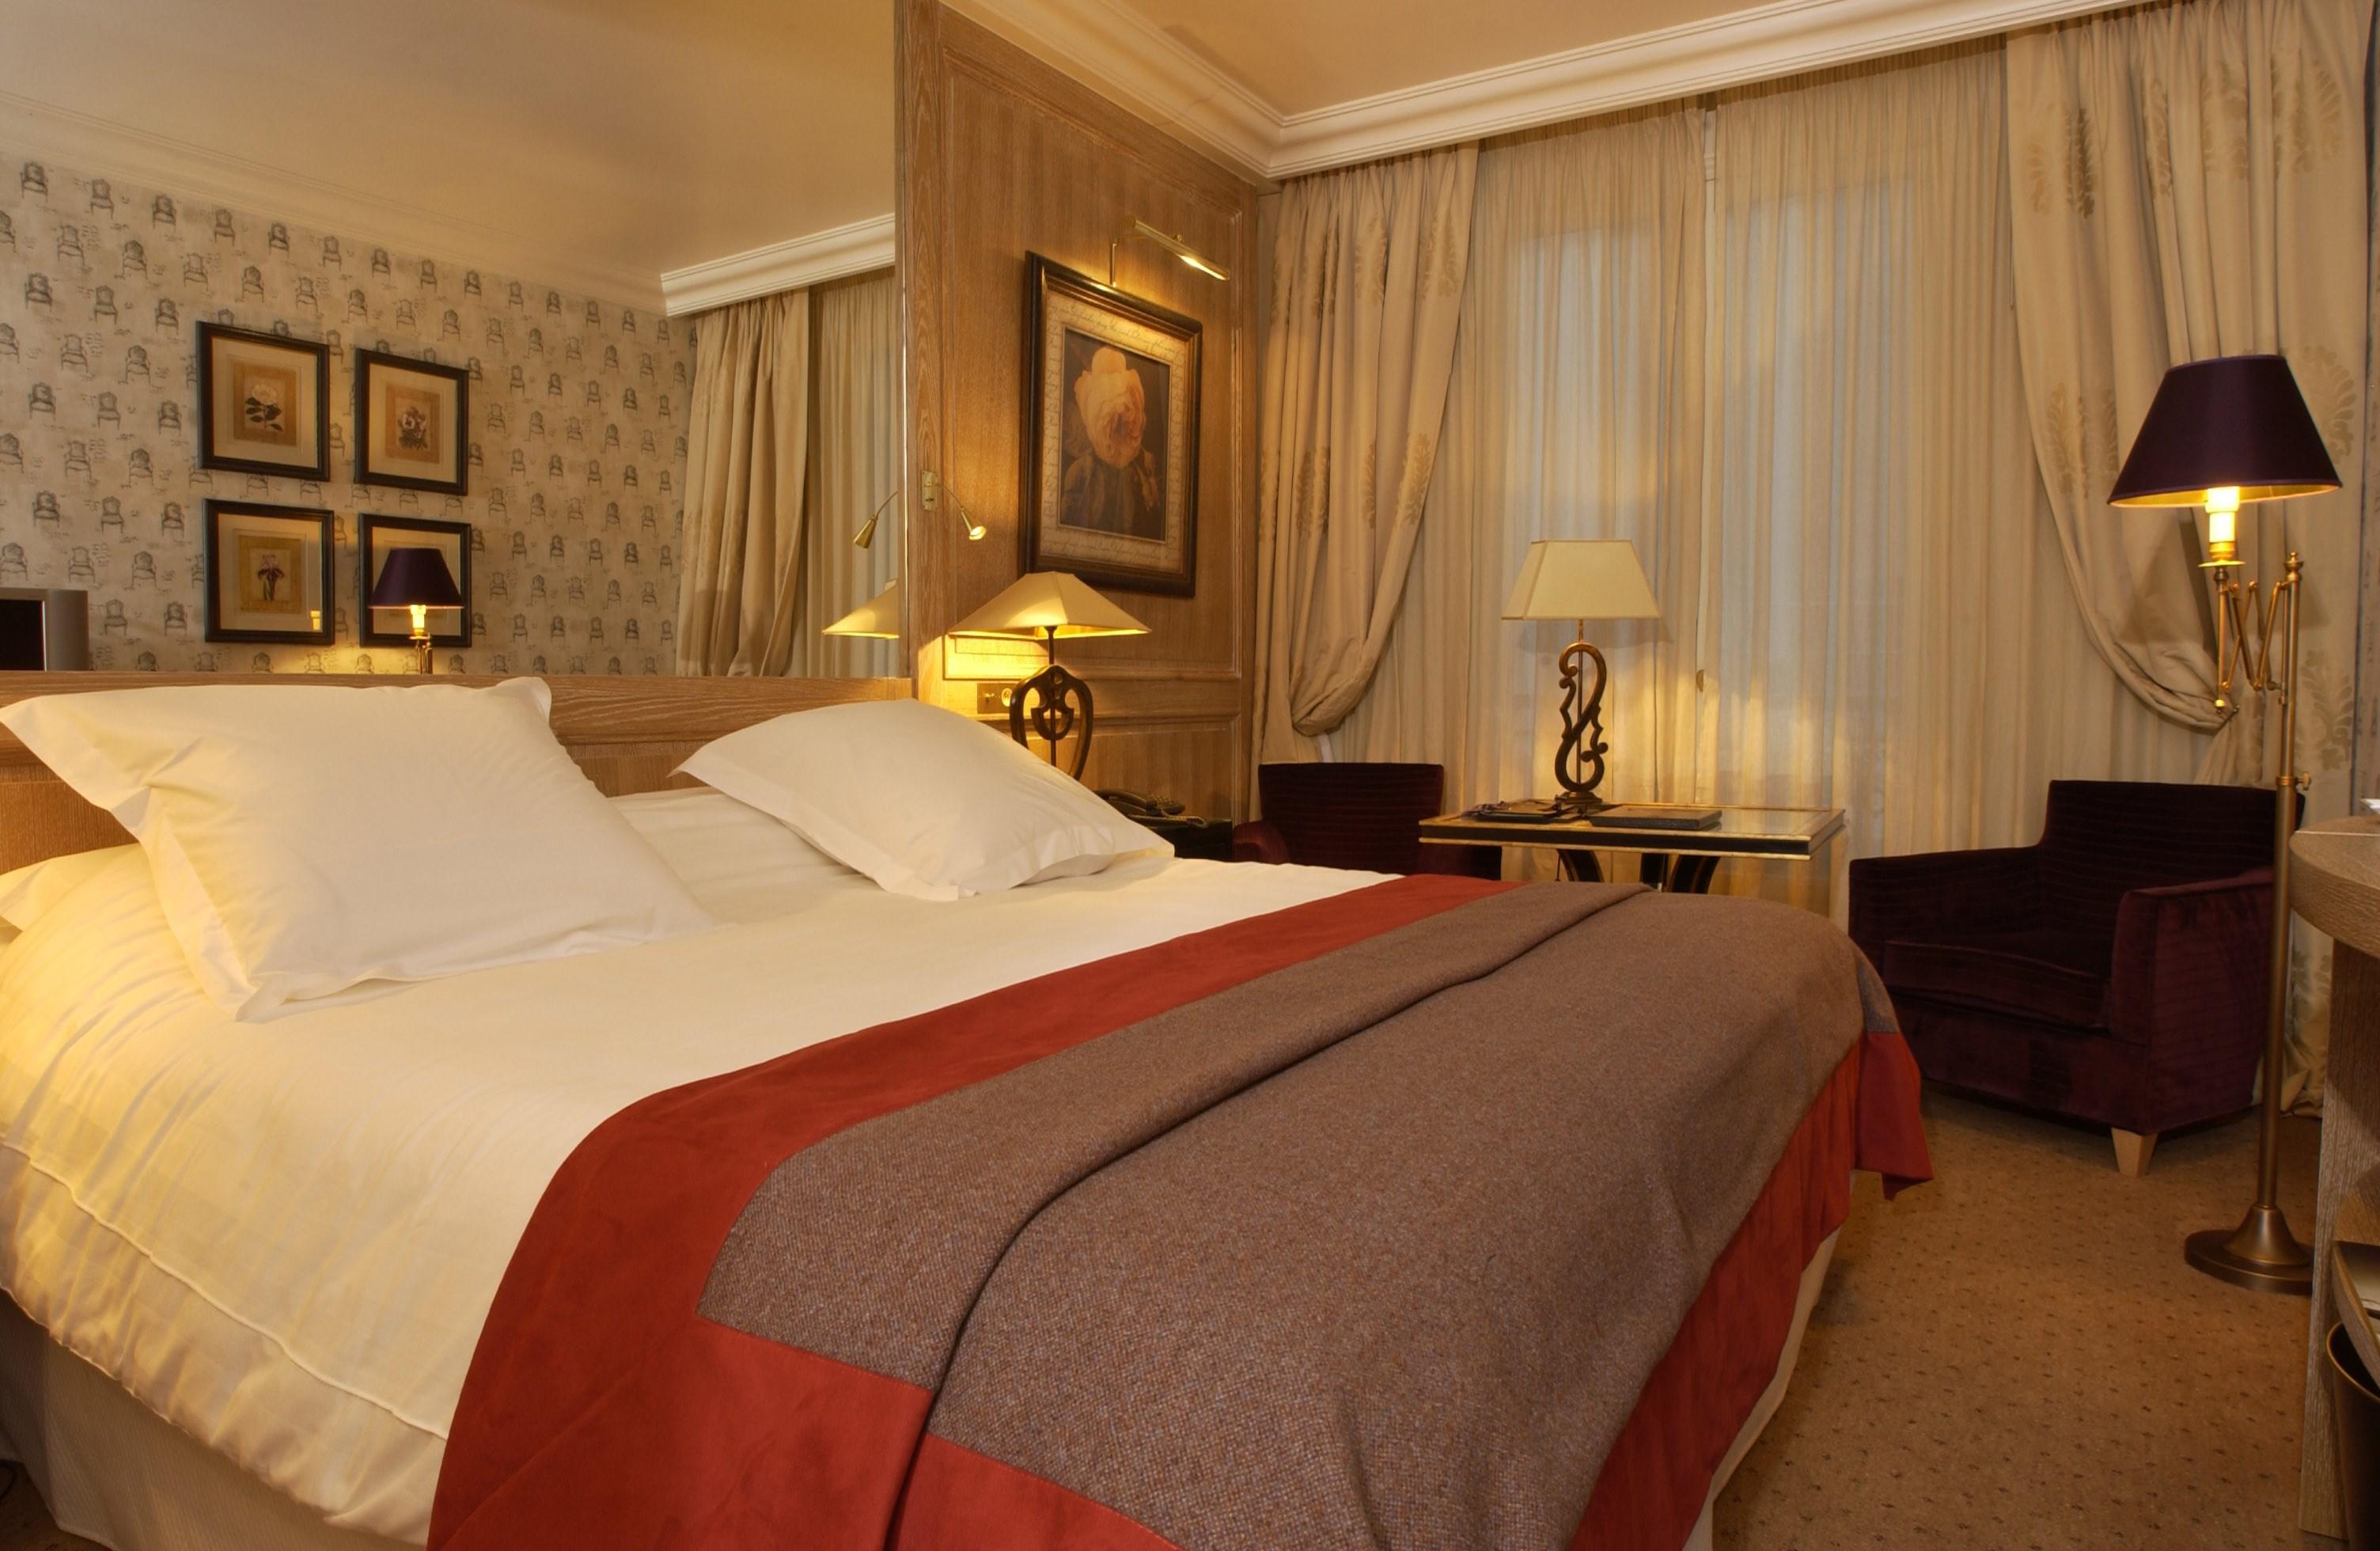 Classic Hotel Rooms Paris Amarante Champs Elys 233 Es France